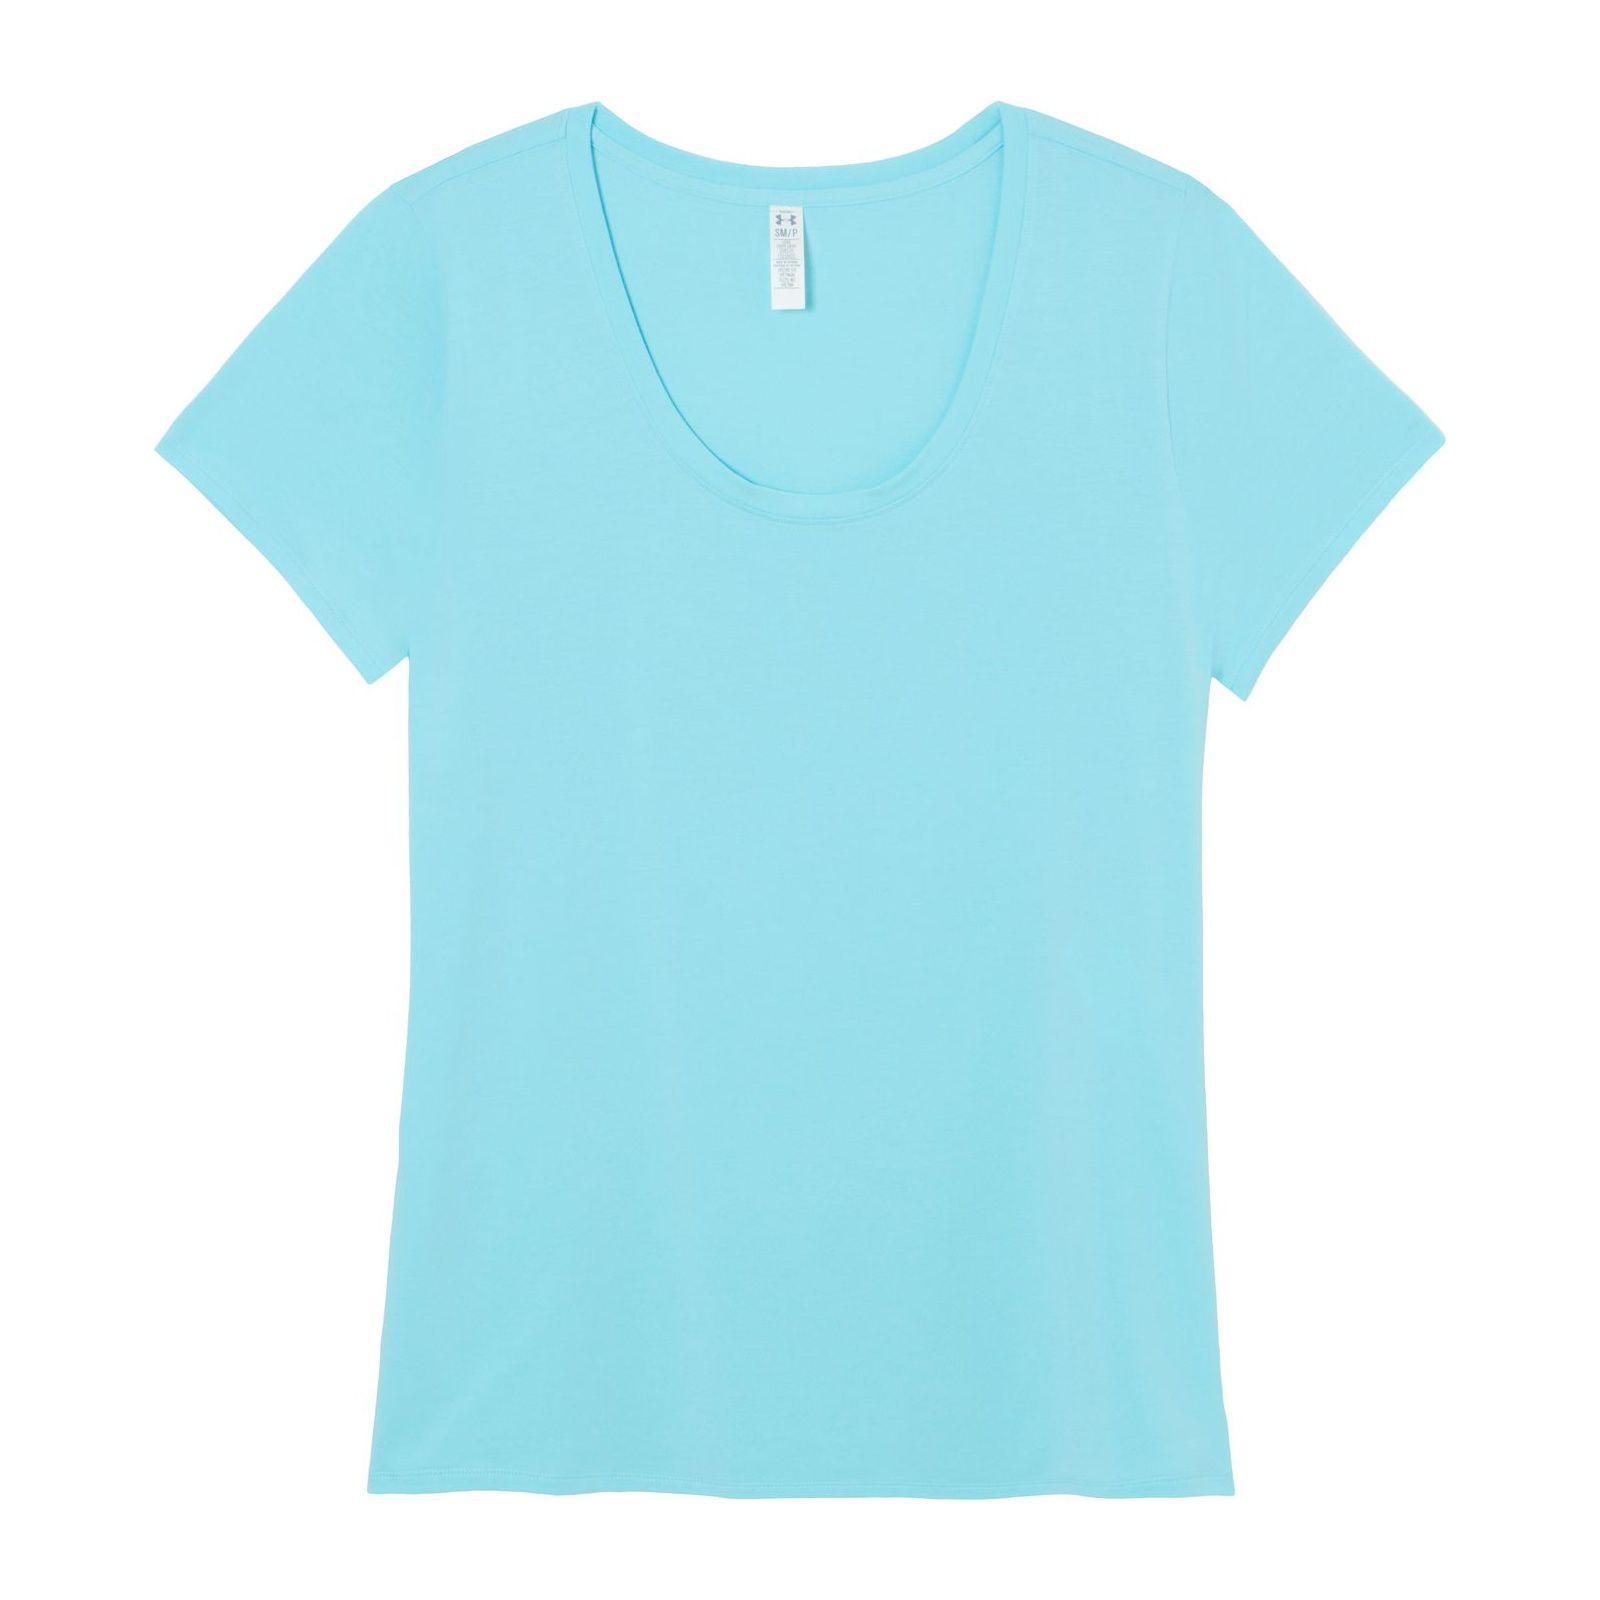 T-Shirt Studio - Azul